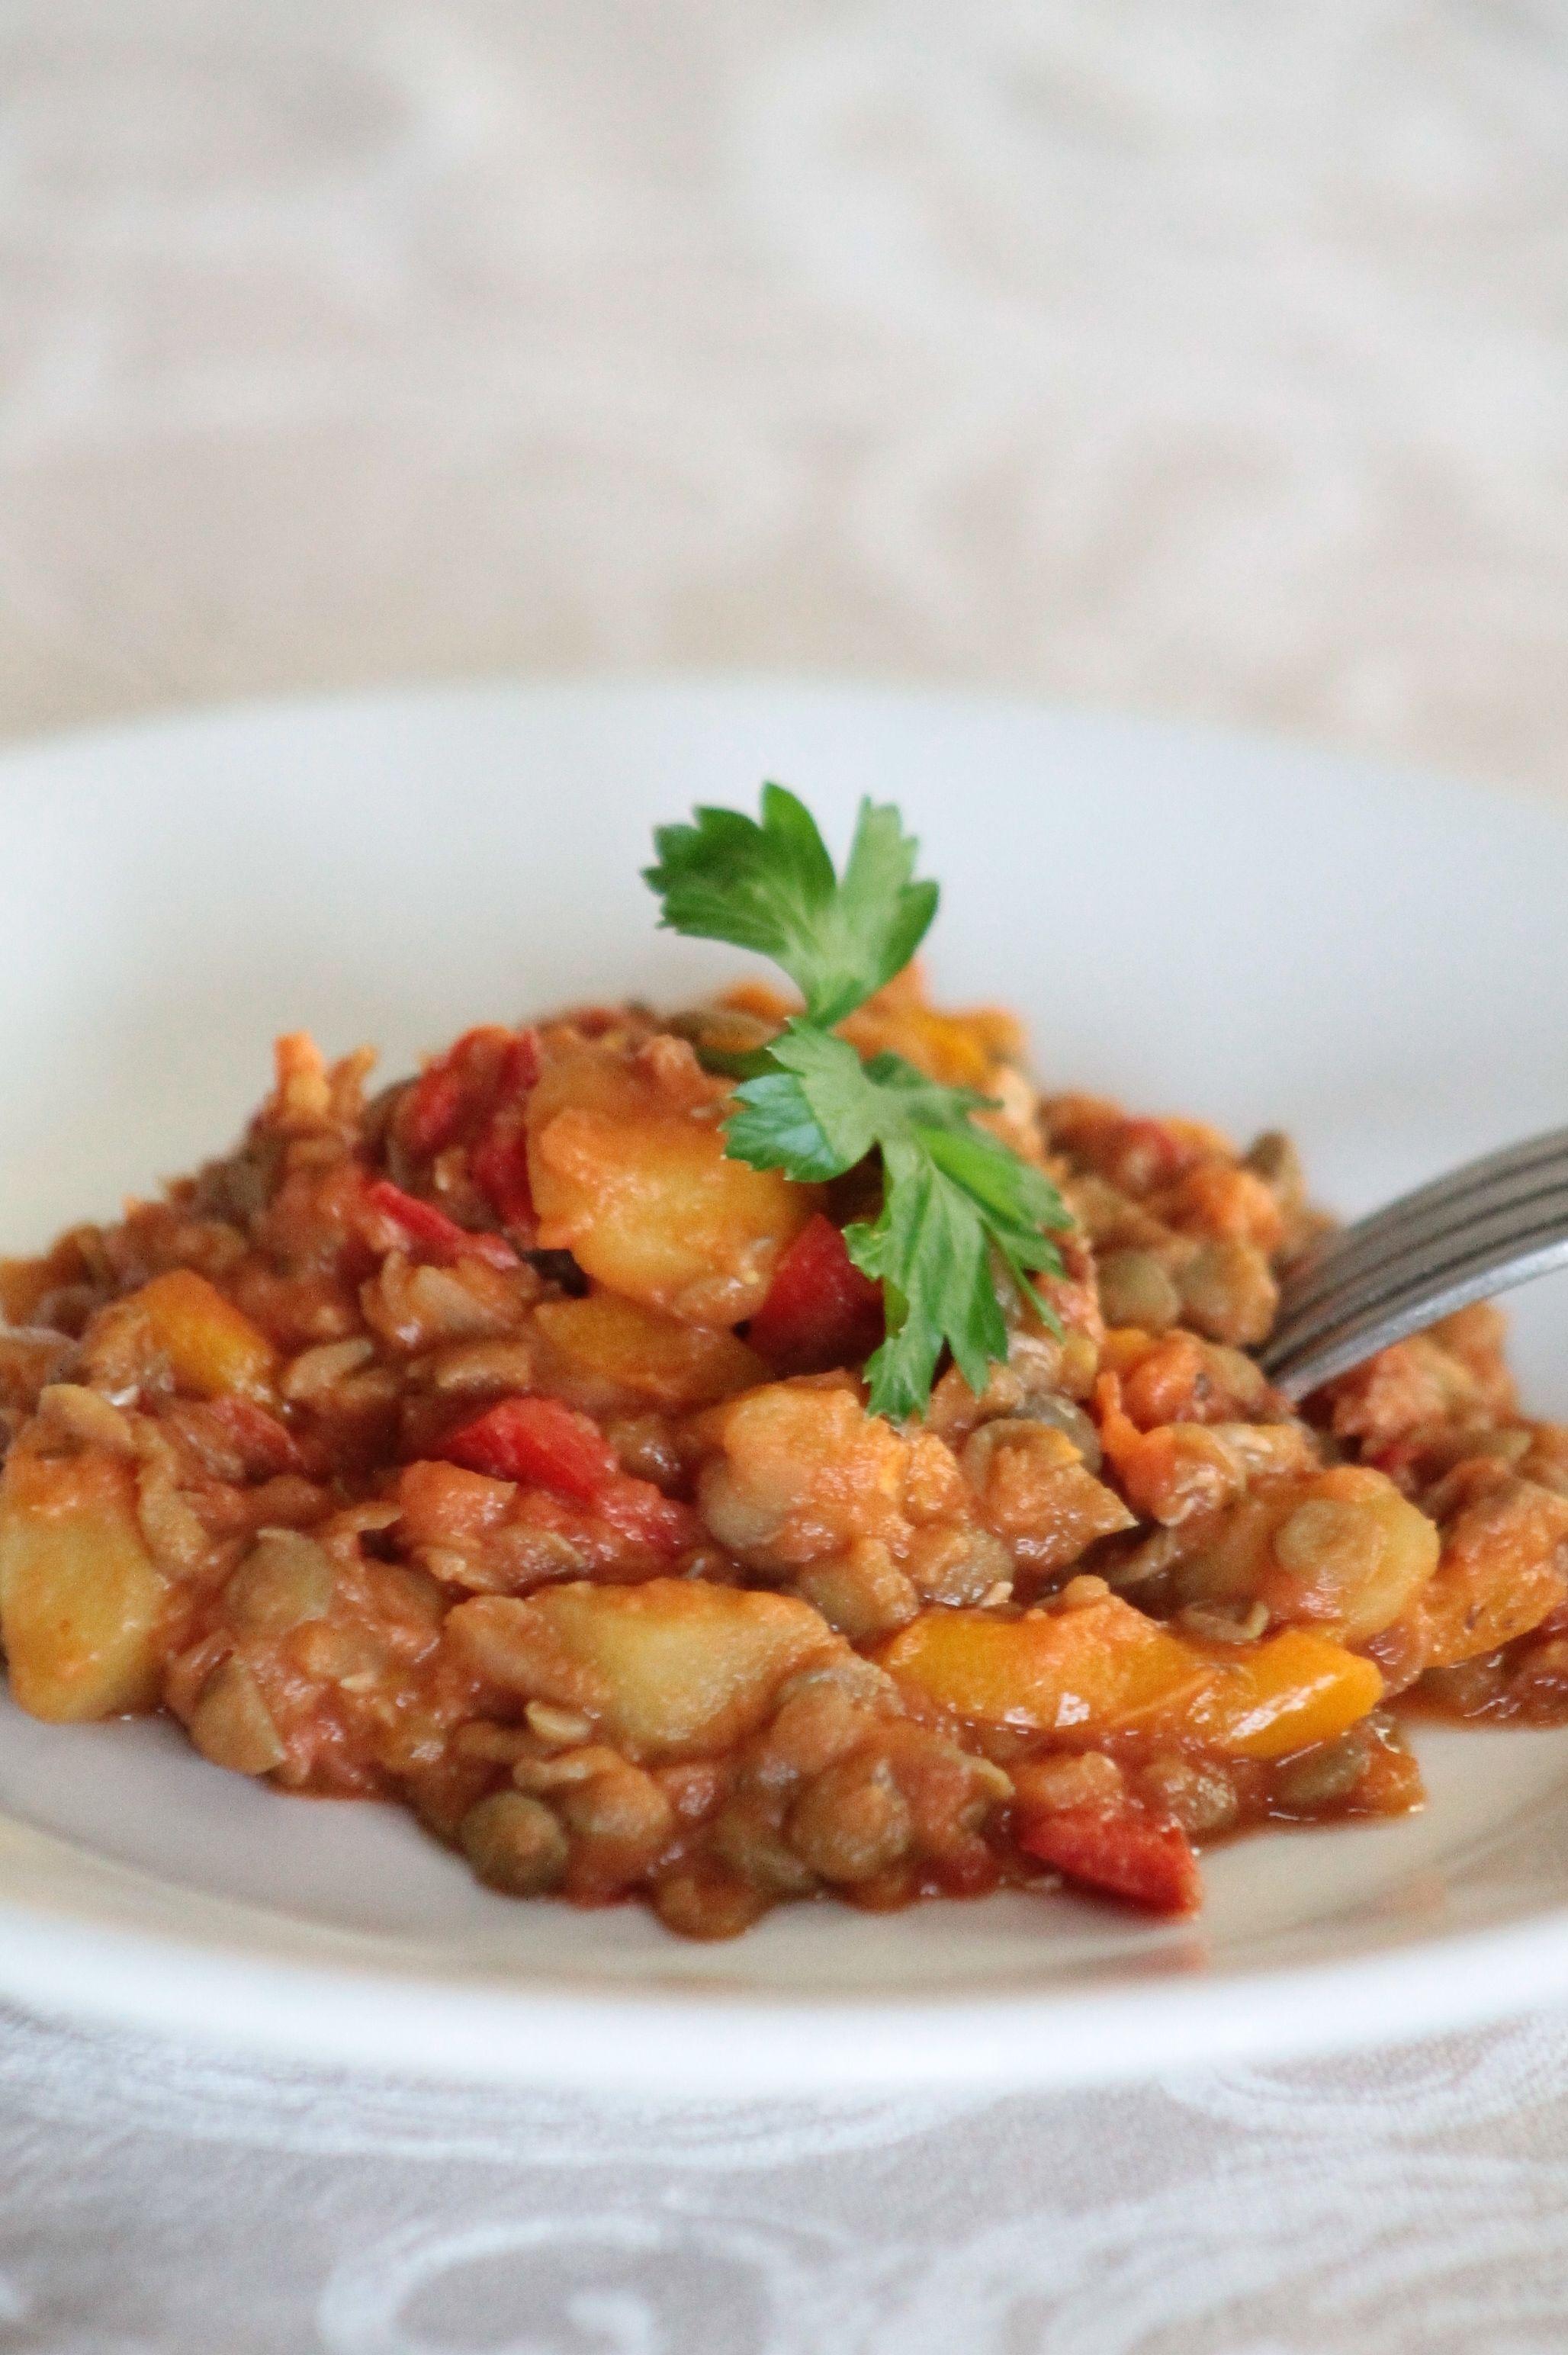 lenticchie e patate in umido #ricetta #lenticchie #patate  #recipes #lentils #potatoes and #vegetables stew